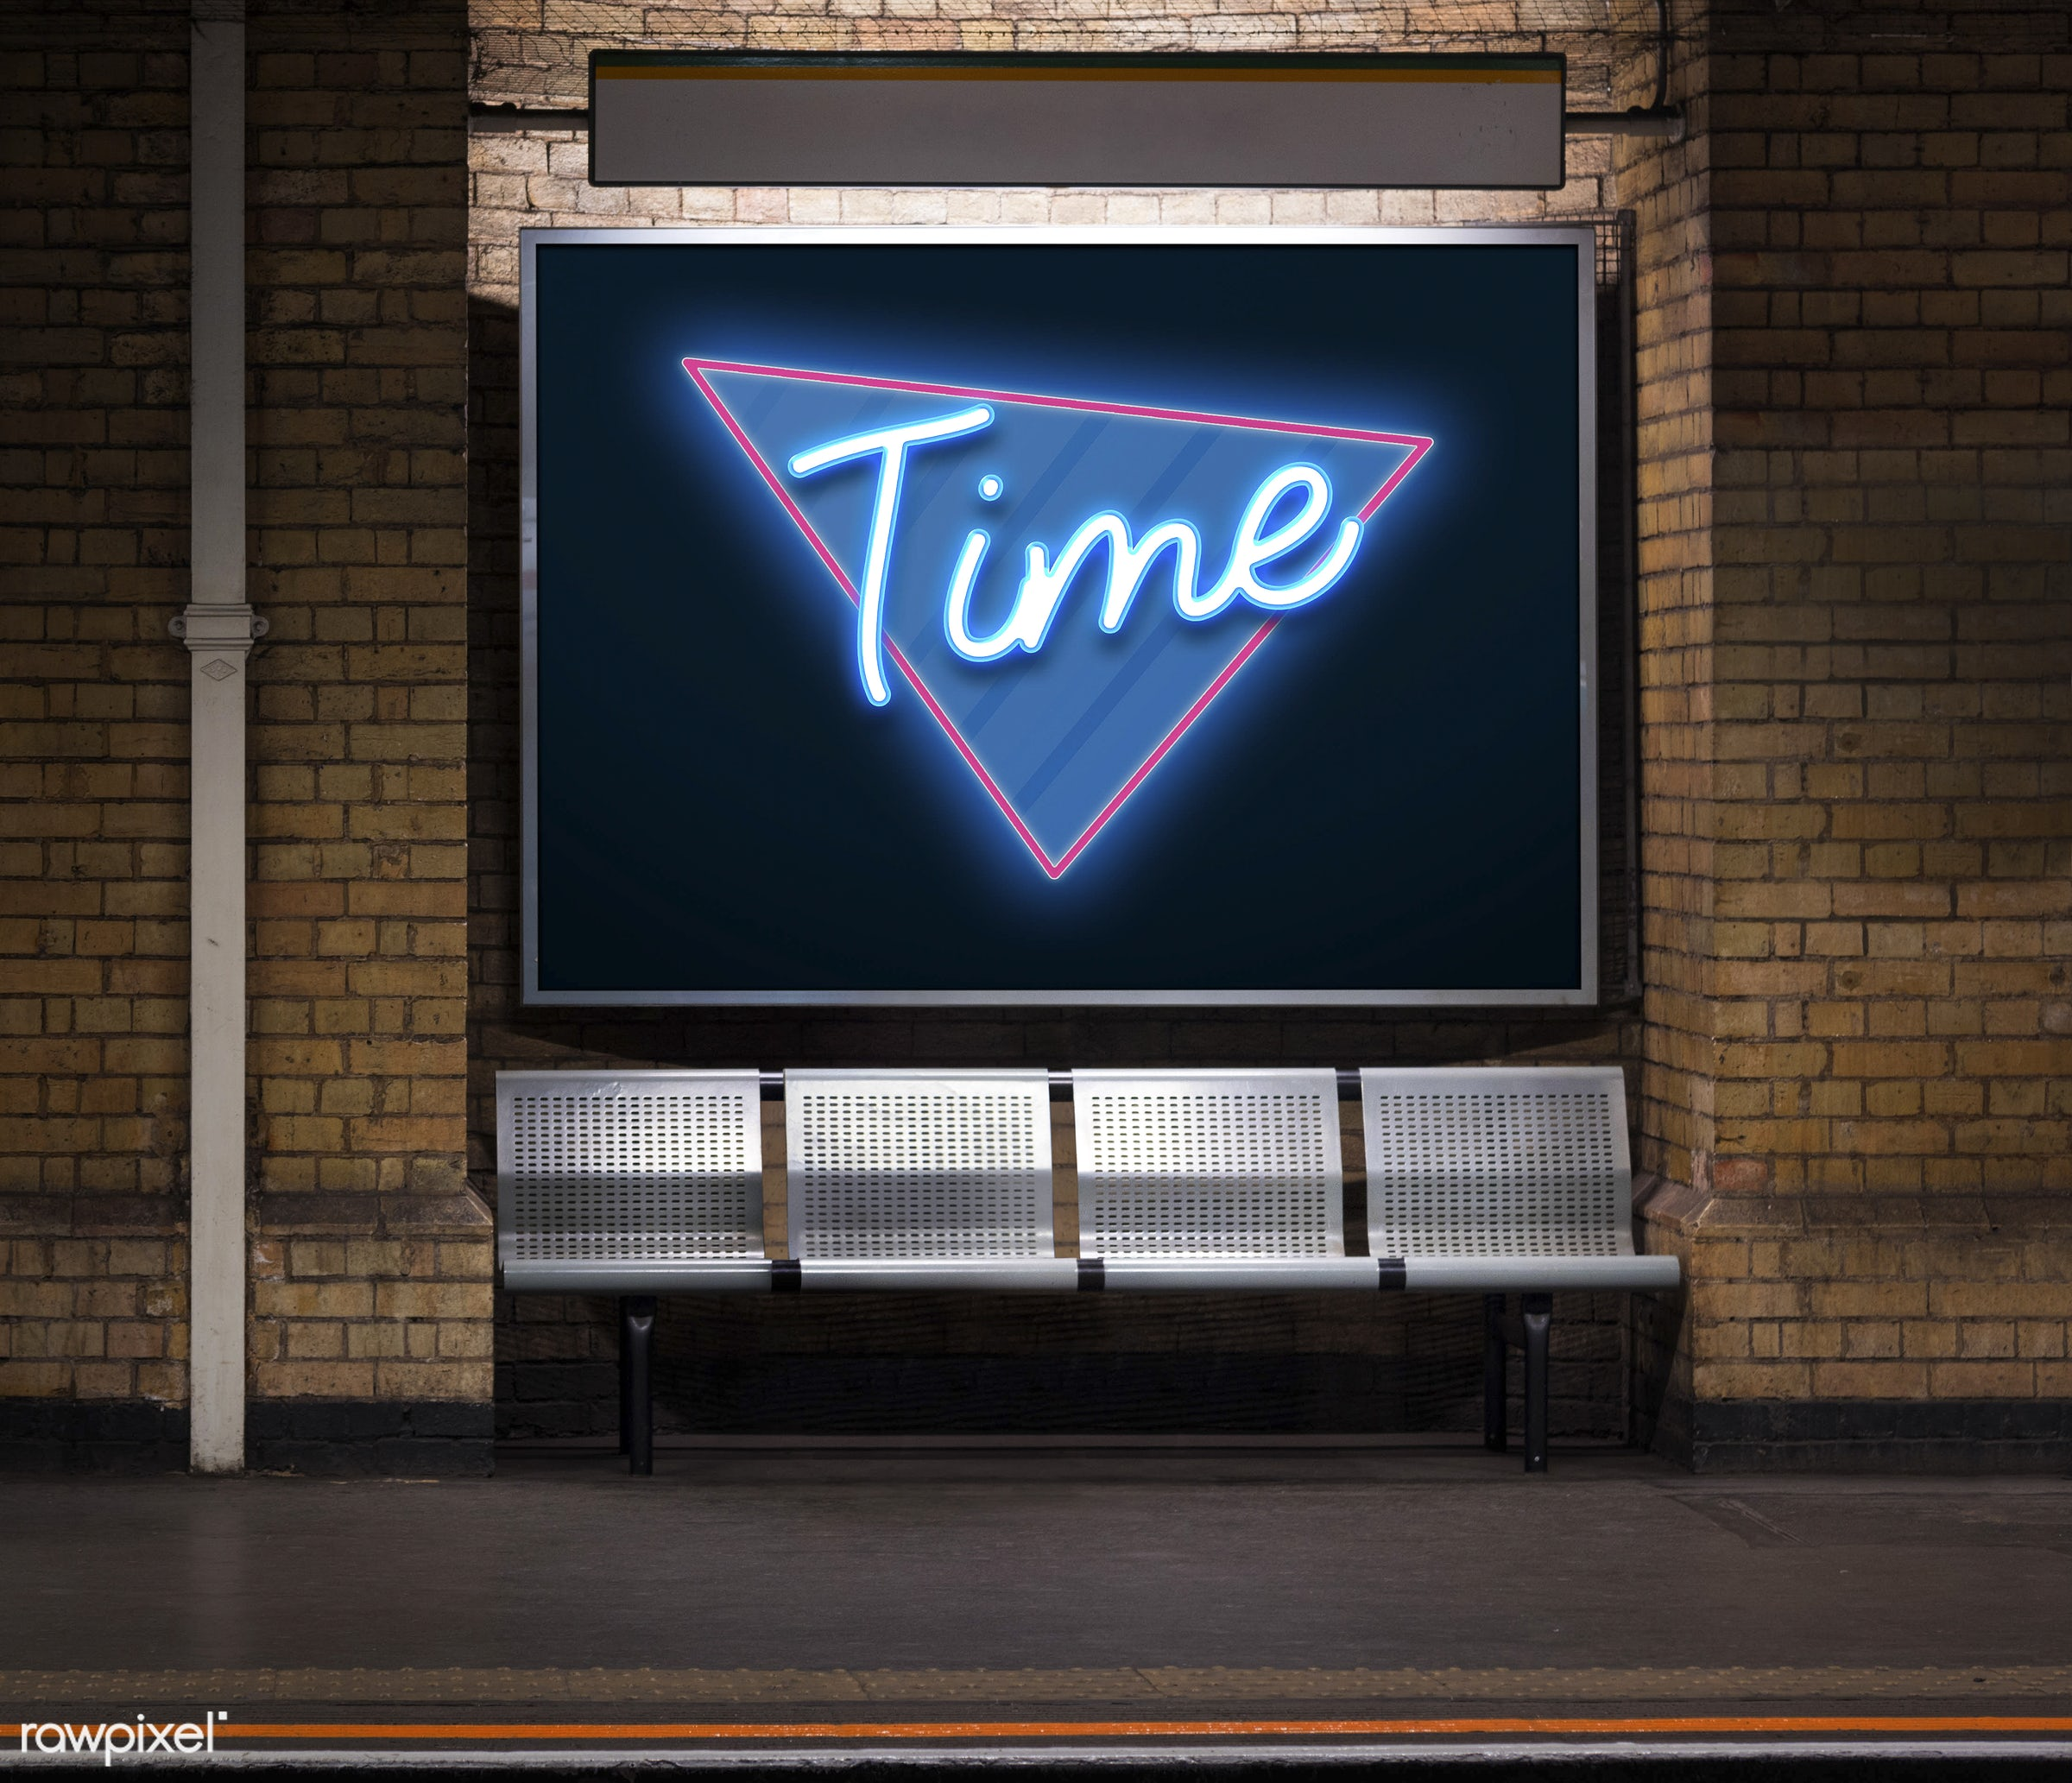 alarm, bricks, brickswall, duration, graphic, handwriting, hour, interval, lifetime, minute, nobody, pipe, platform, present...